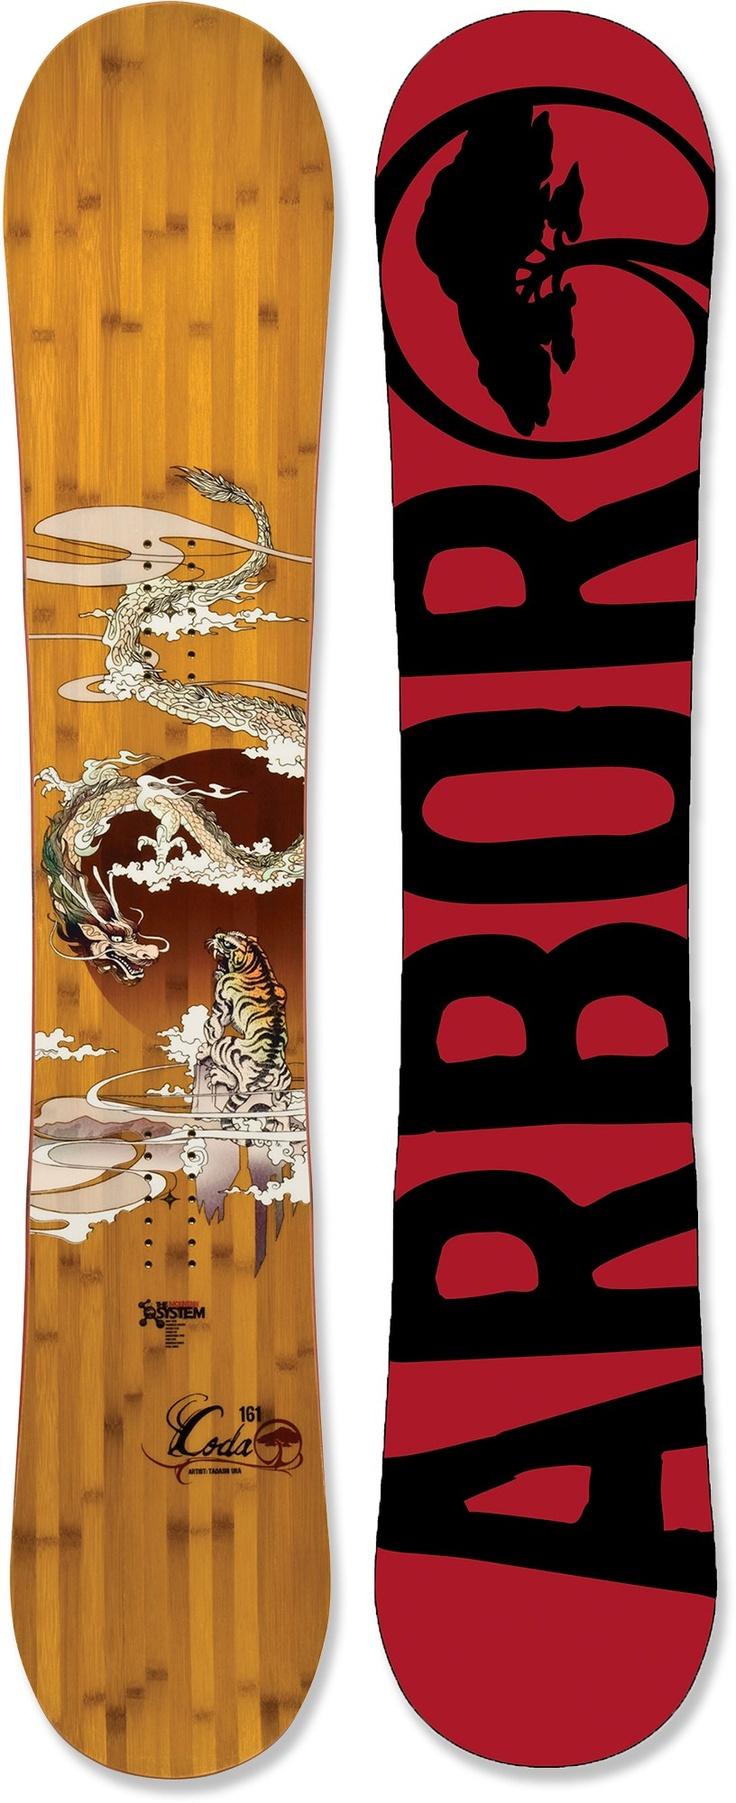 Arbor Coda Snowboard - 2011/2012  $399.93 $499.95*